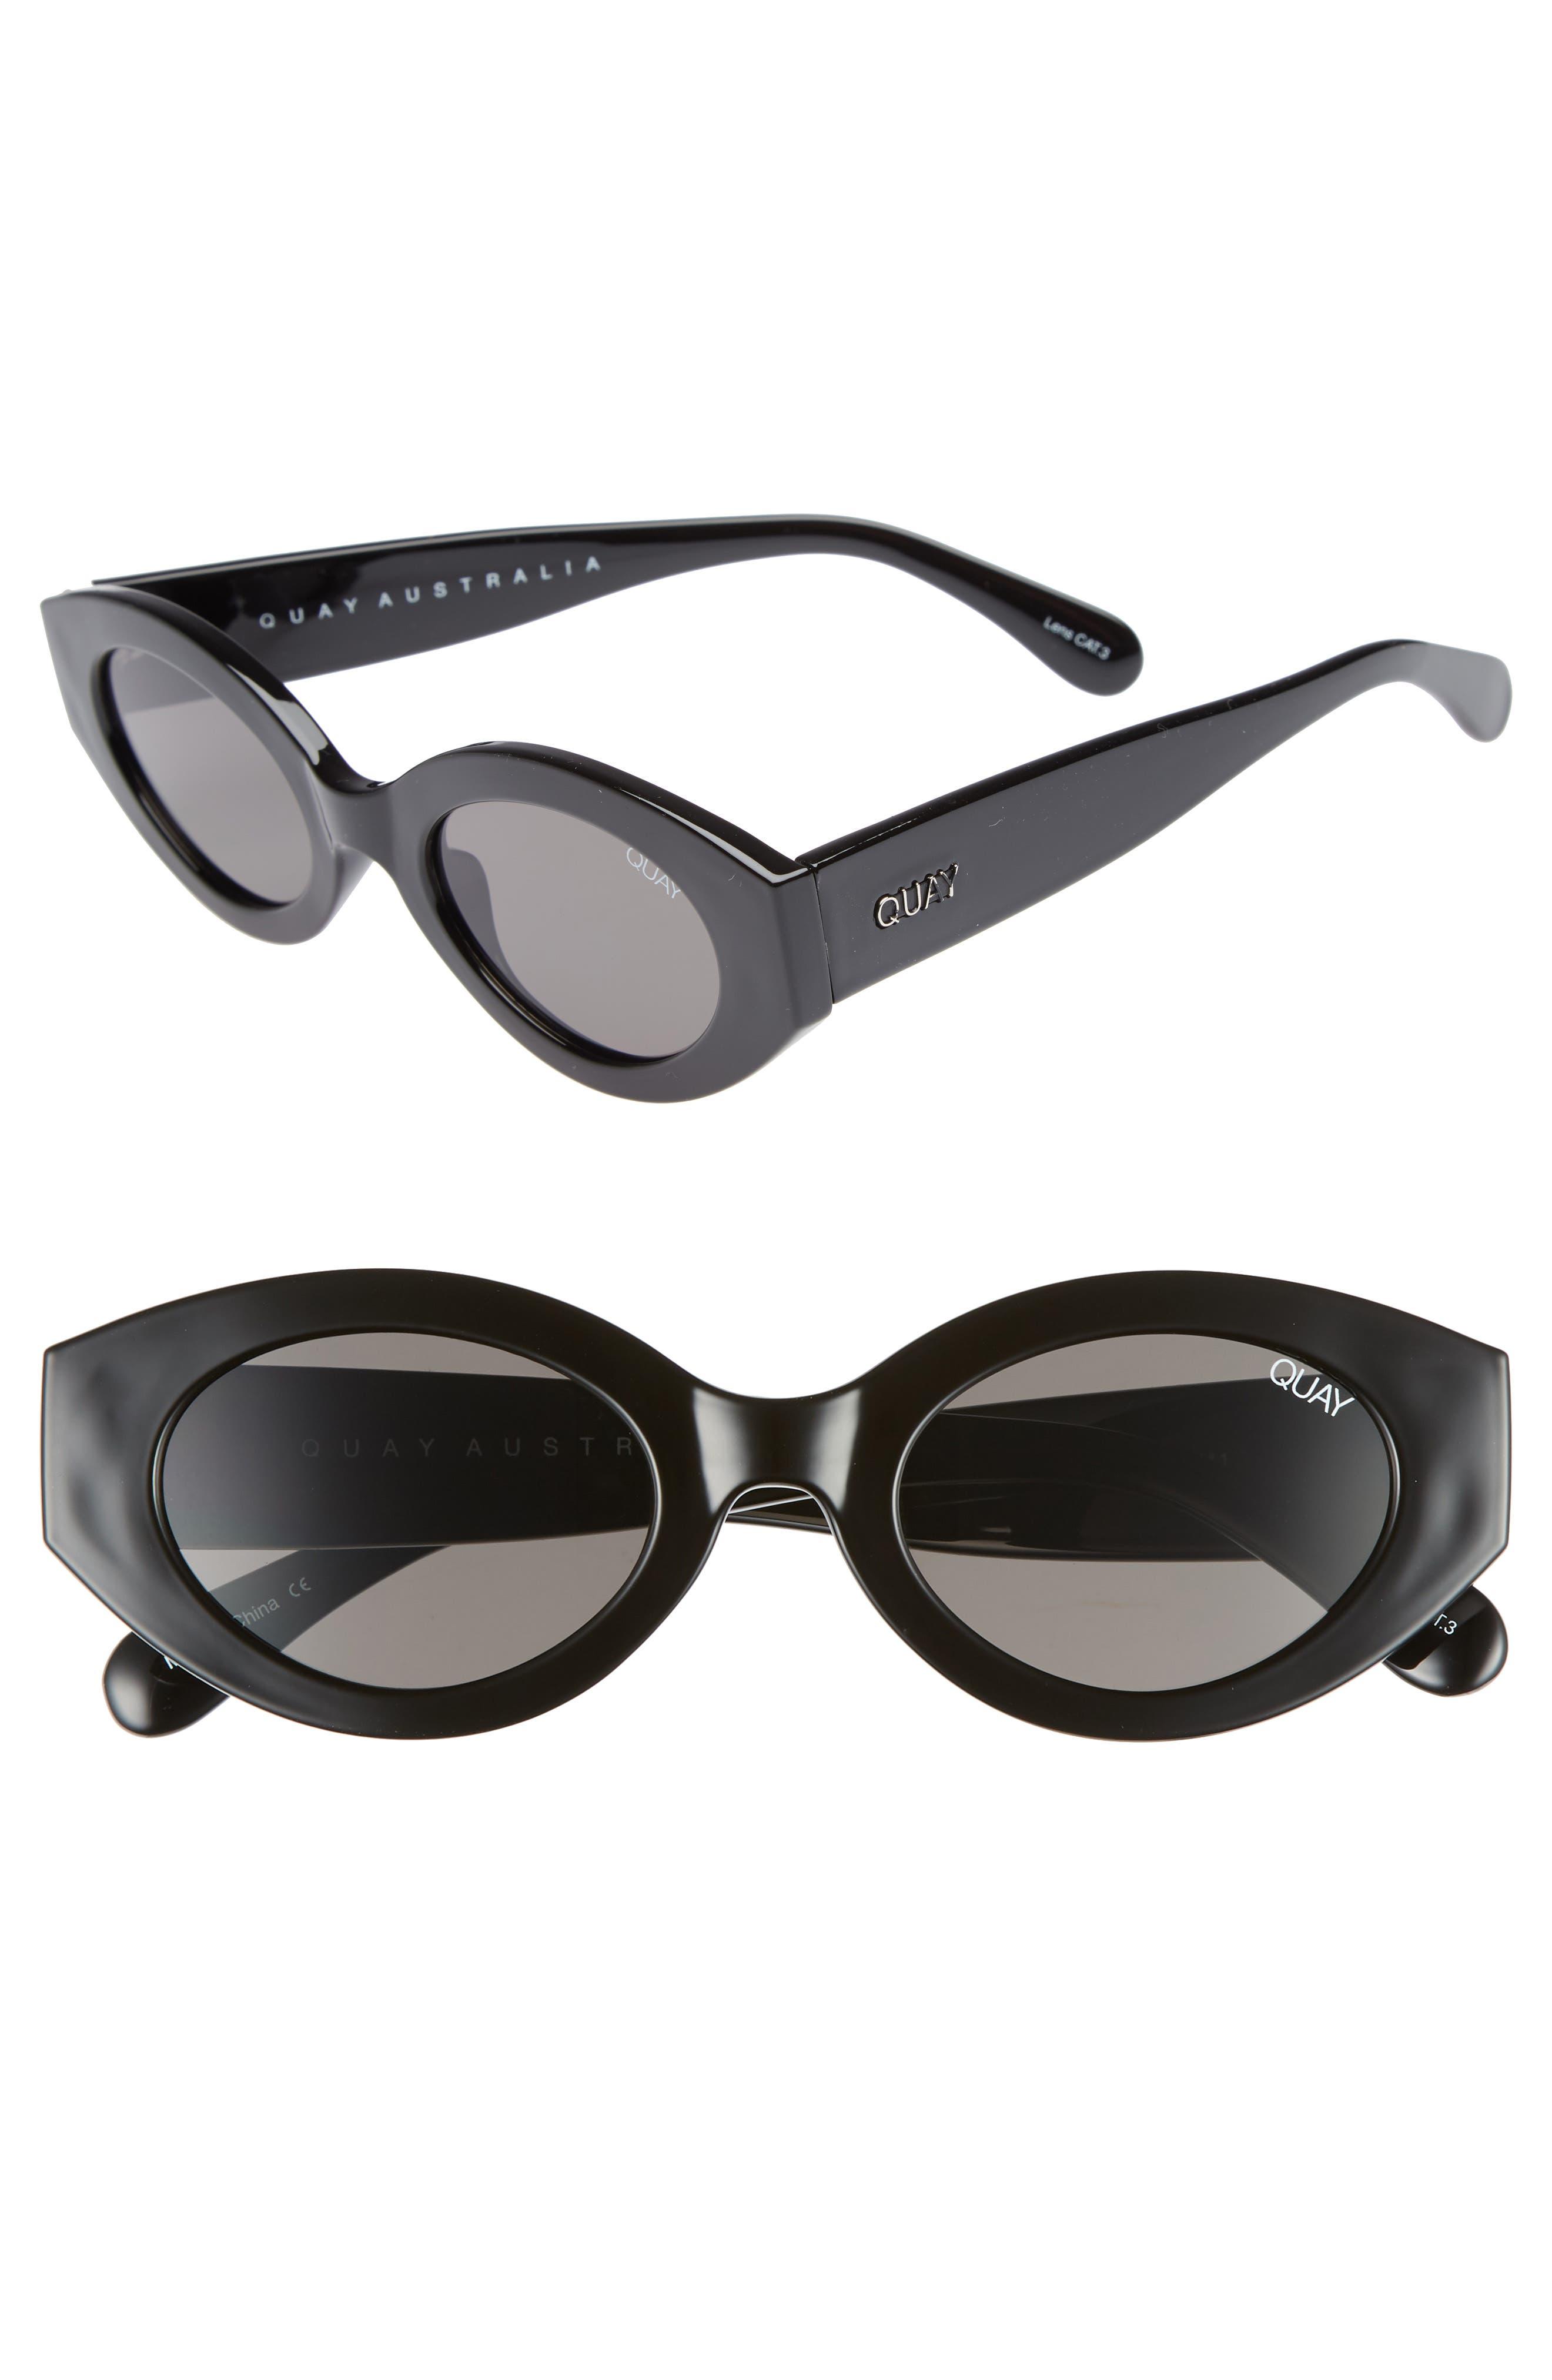 See Me Smile 50Mm Cat Eye Sunglasses - Black/ Smoke